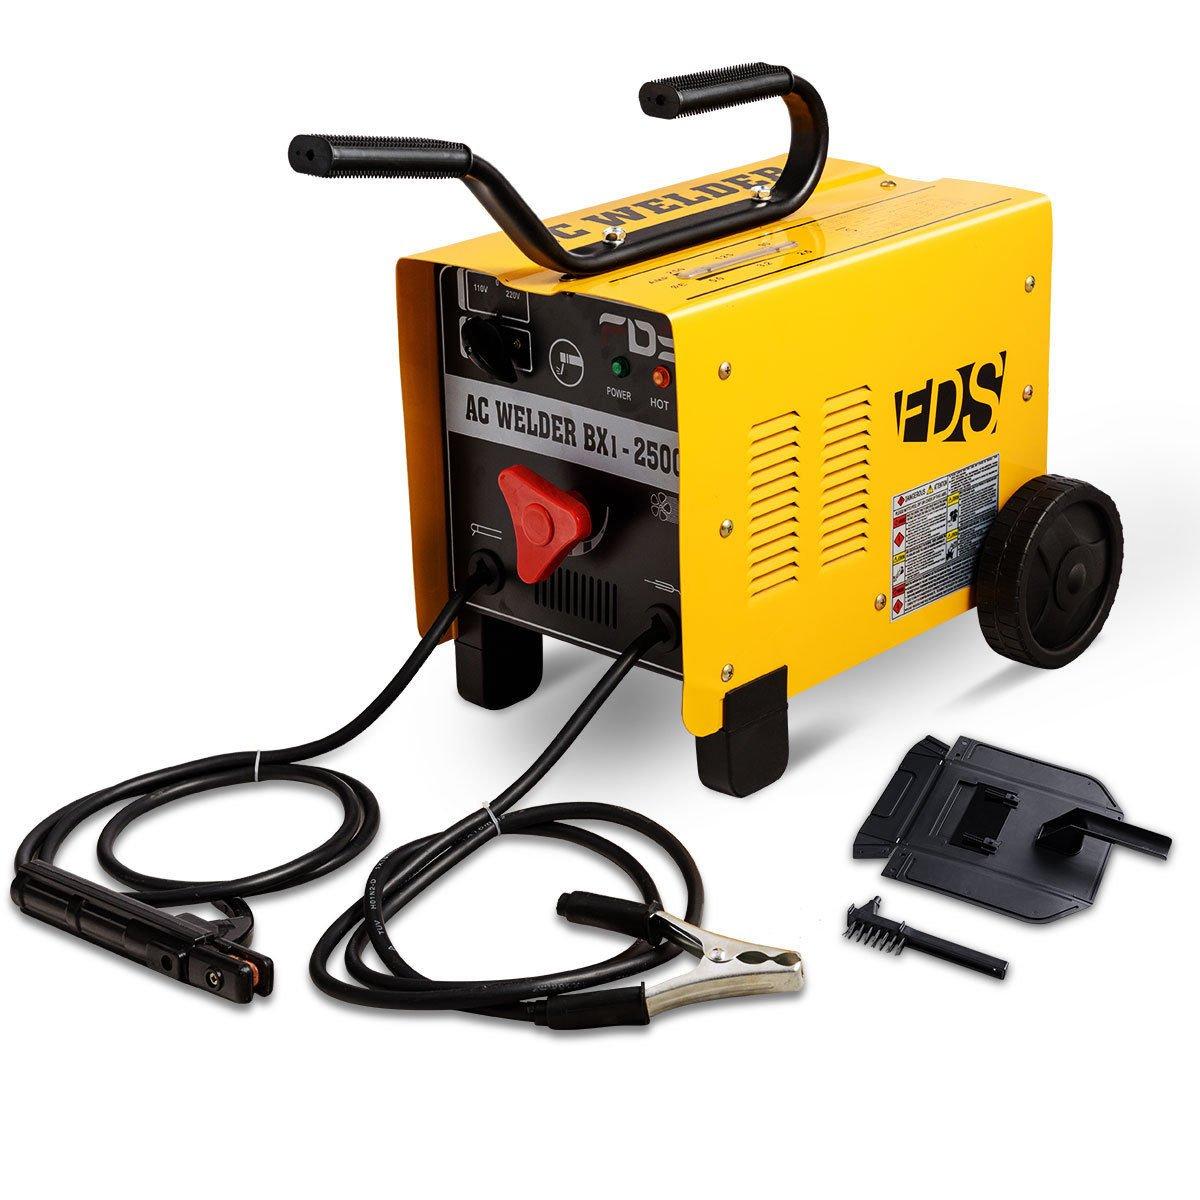 Goplus Arc Welder Welding Machine 250 Amp 110v 220v Soldering On Gun Or Cables And Welders Transformer Accessories Tools